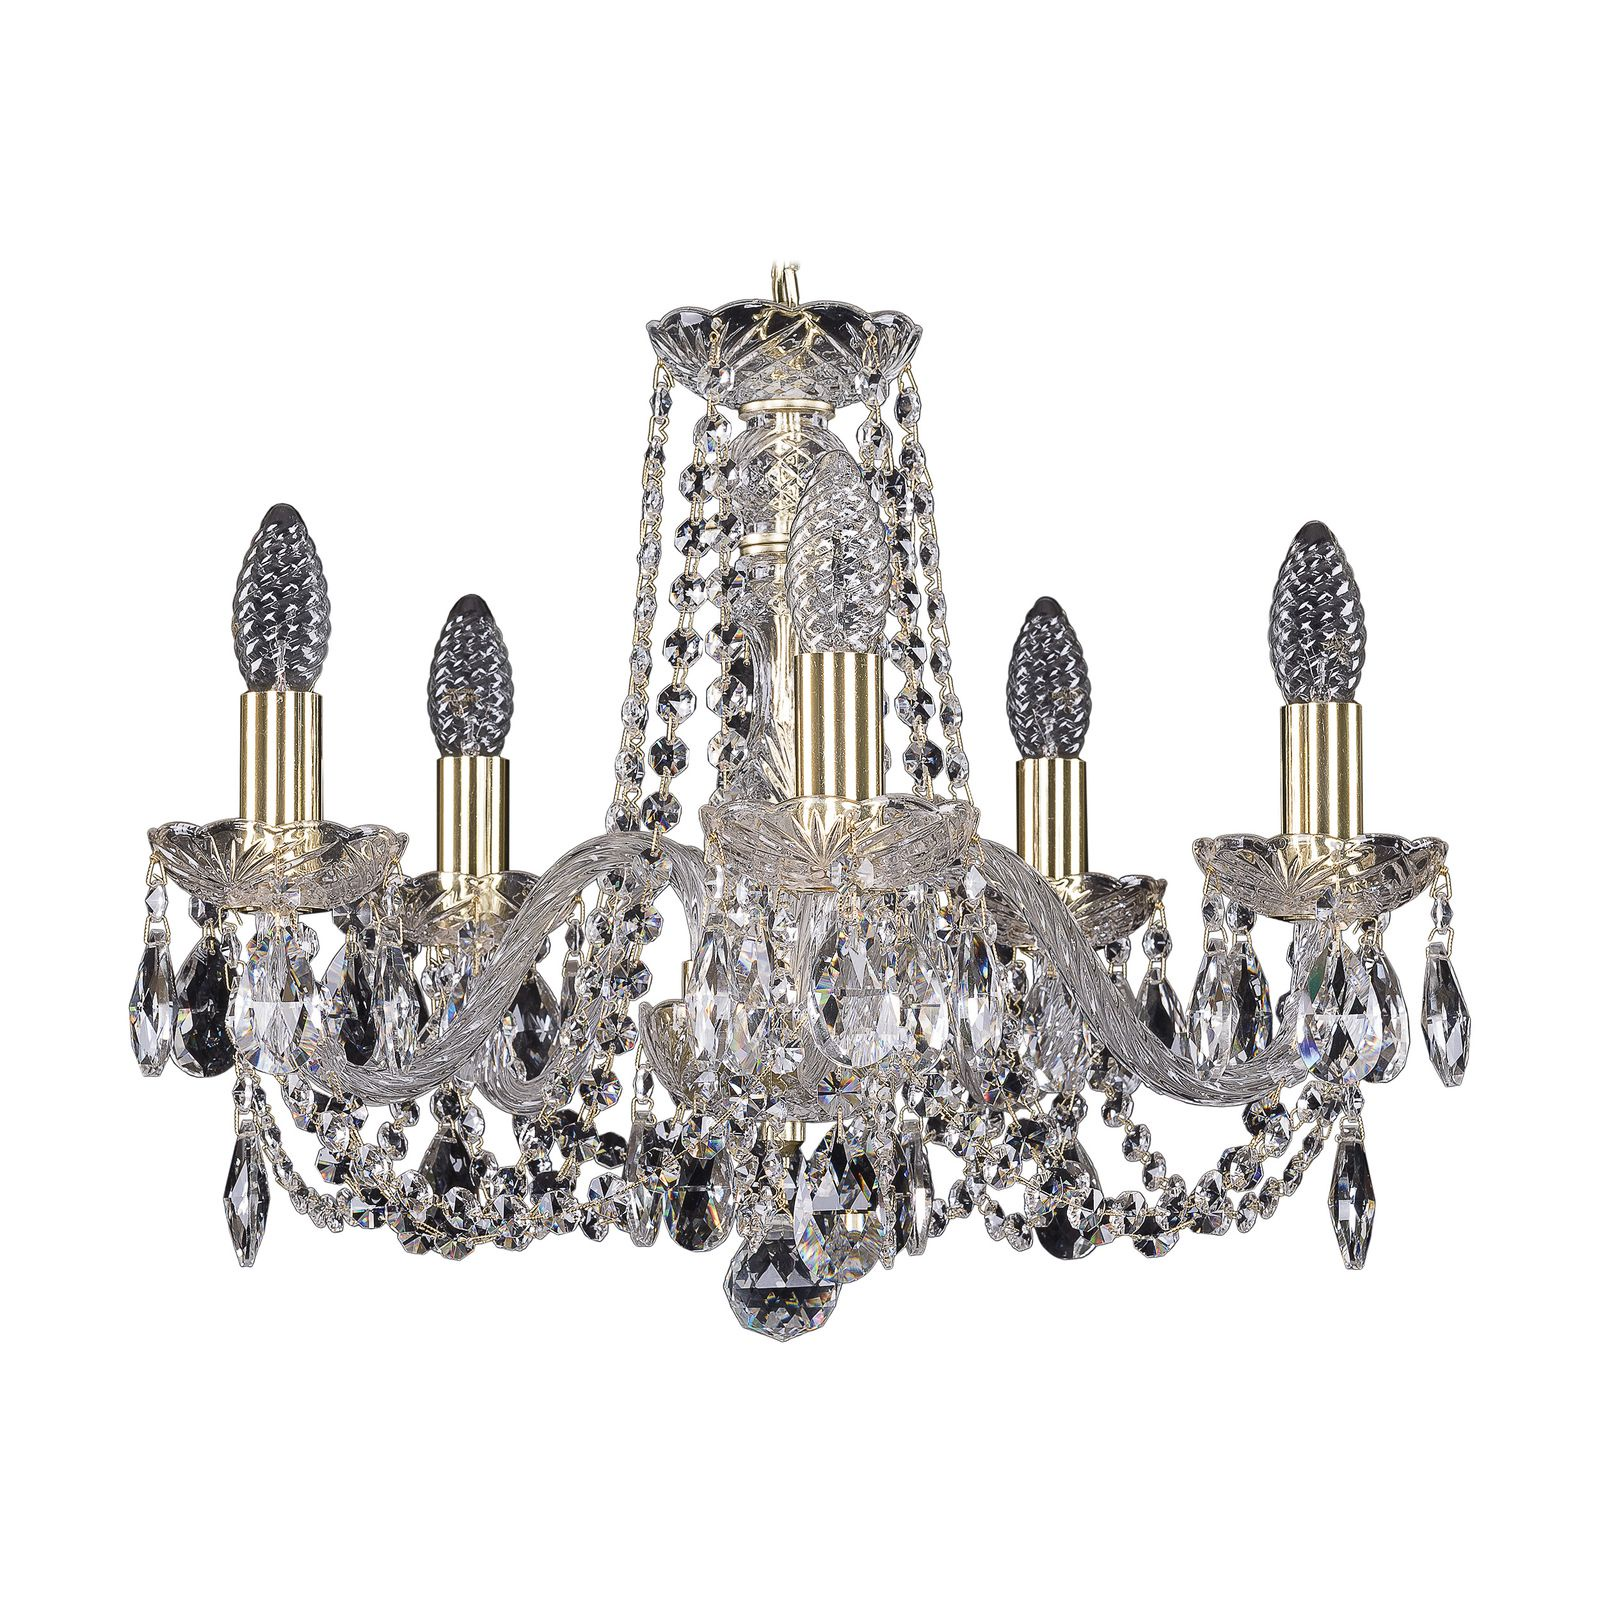 Потолочный светильник Bohemia Ivele Crystal 1402/5/160 G, E14, 40 Вт bohemia ivele crystal 1932 75z g